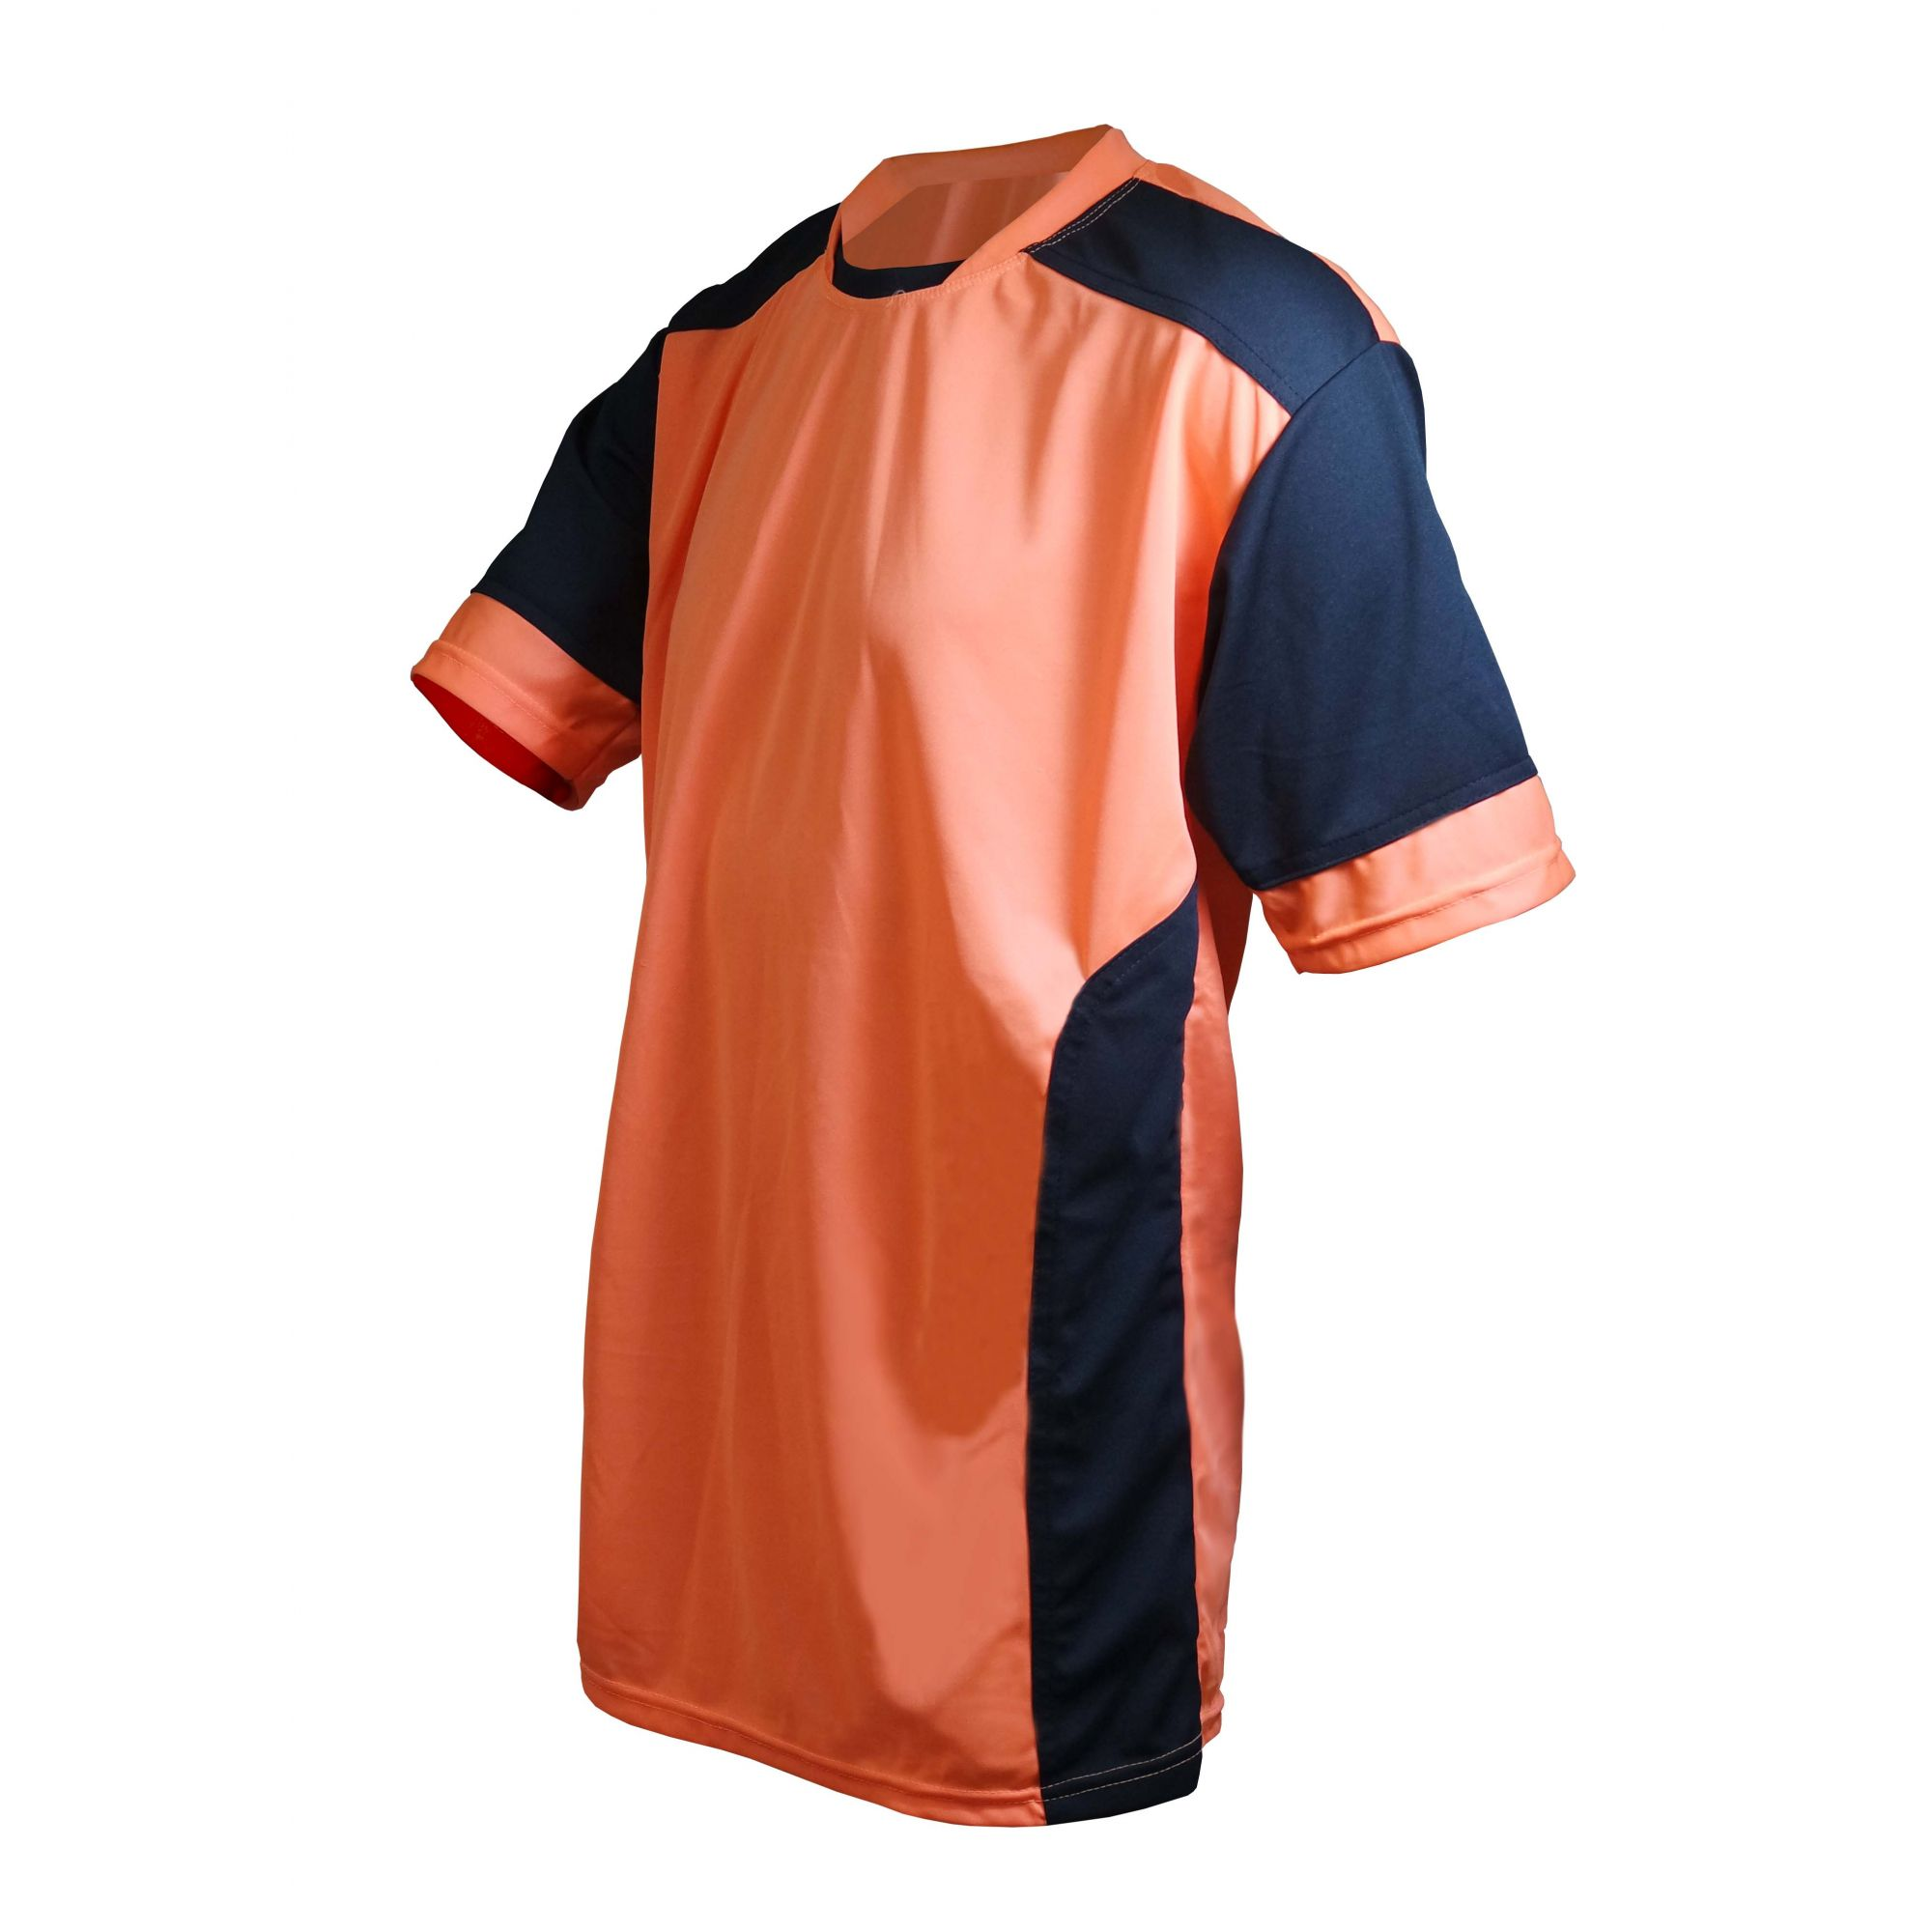 Camisa de Futebol Avante Ligth